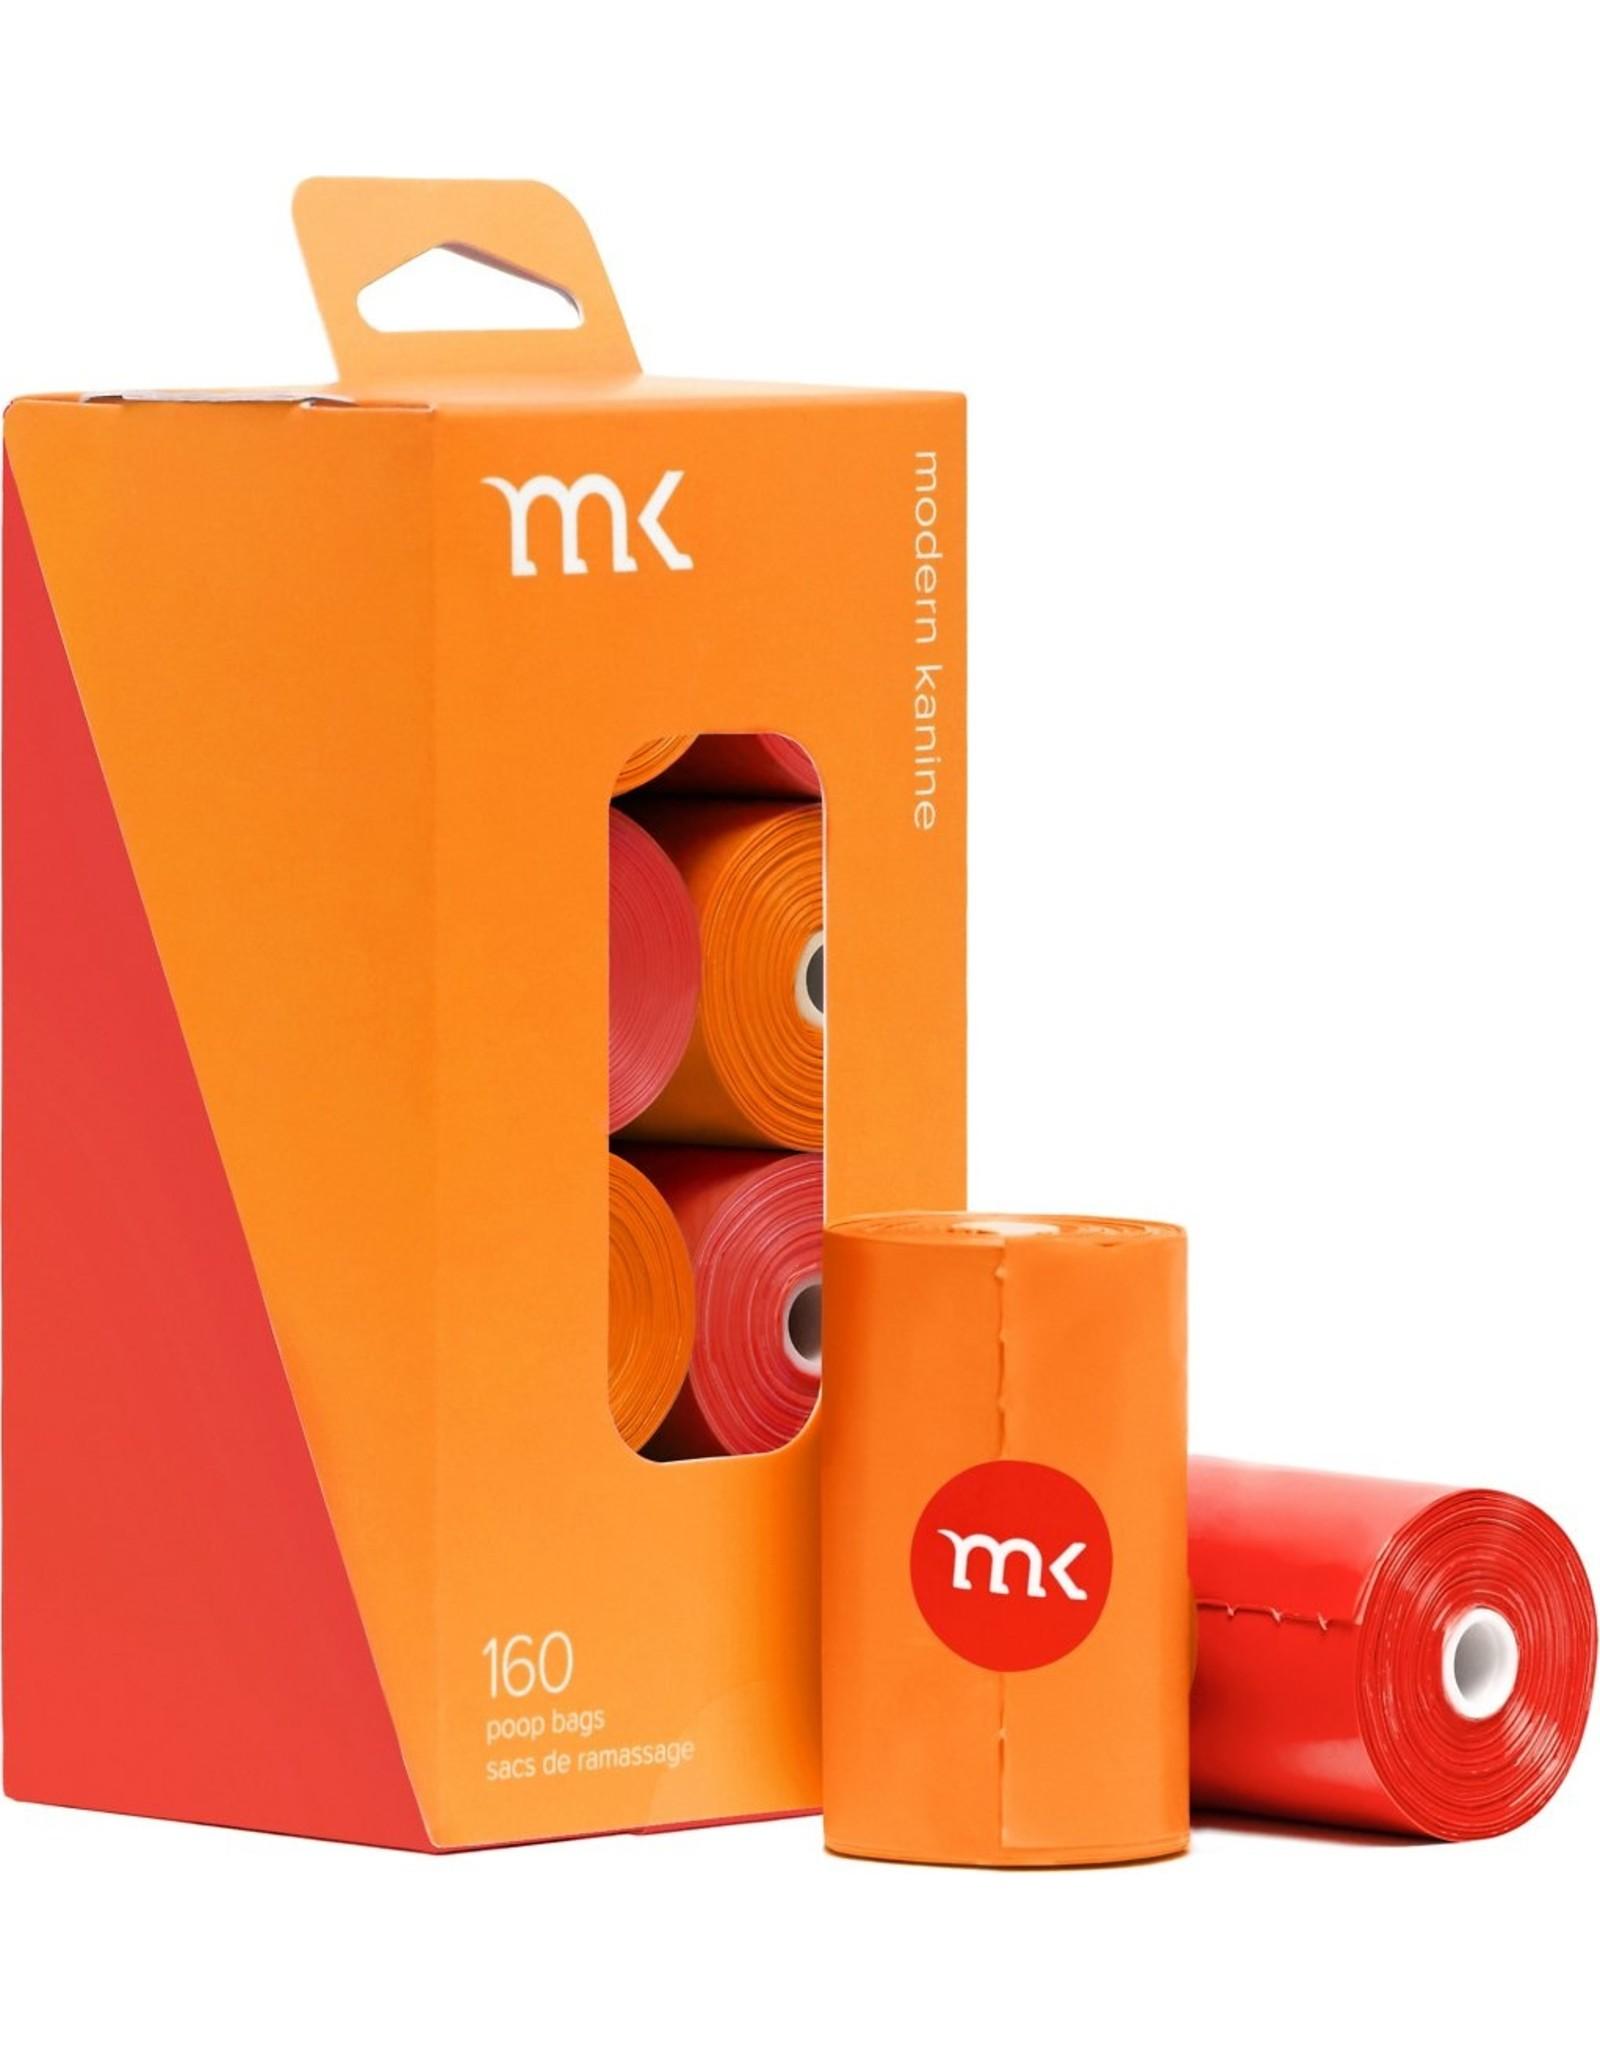 Modern Kanine MK Waste Bags 160ct